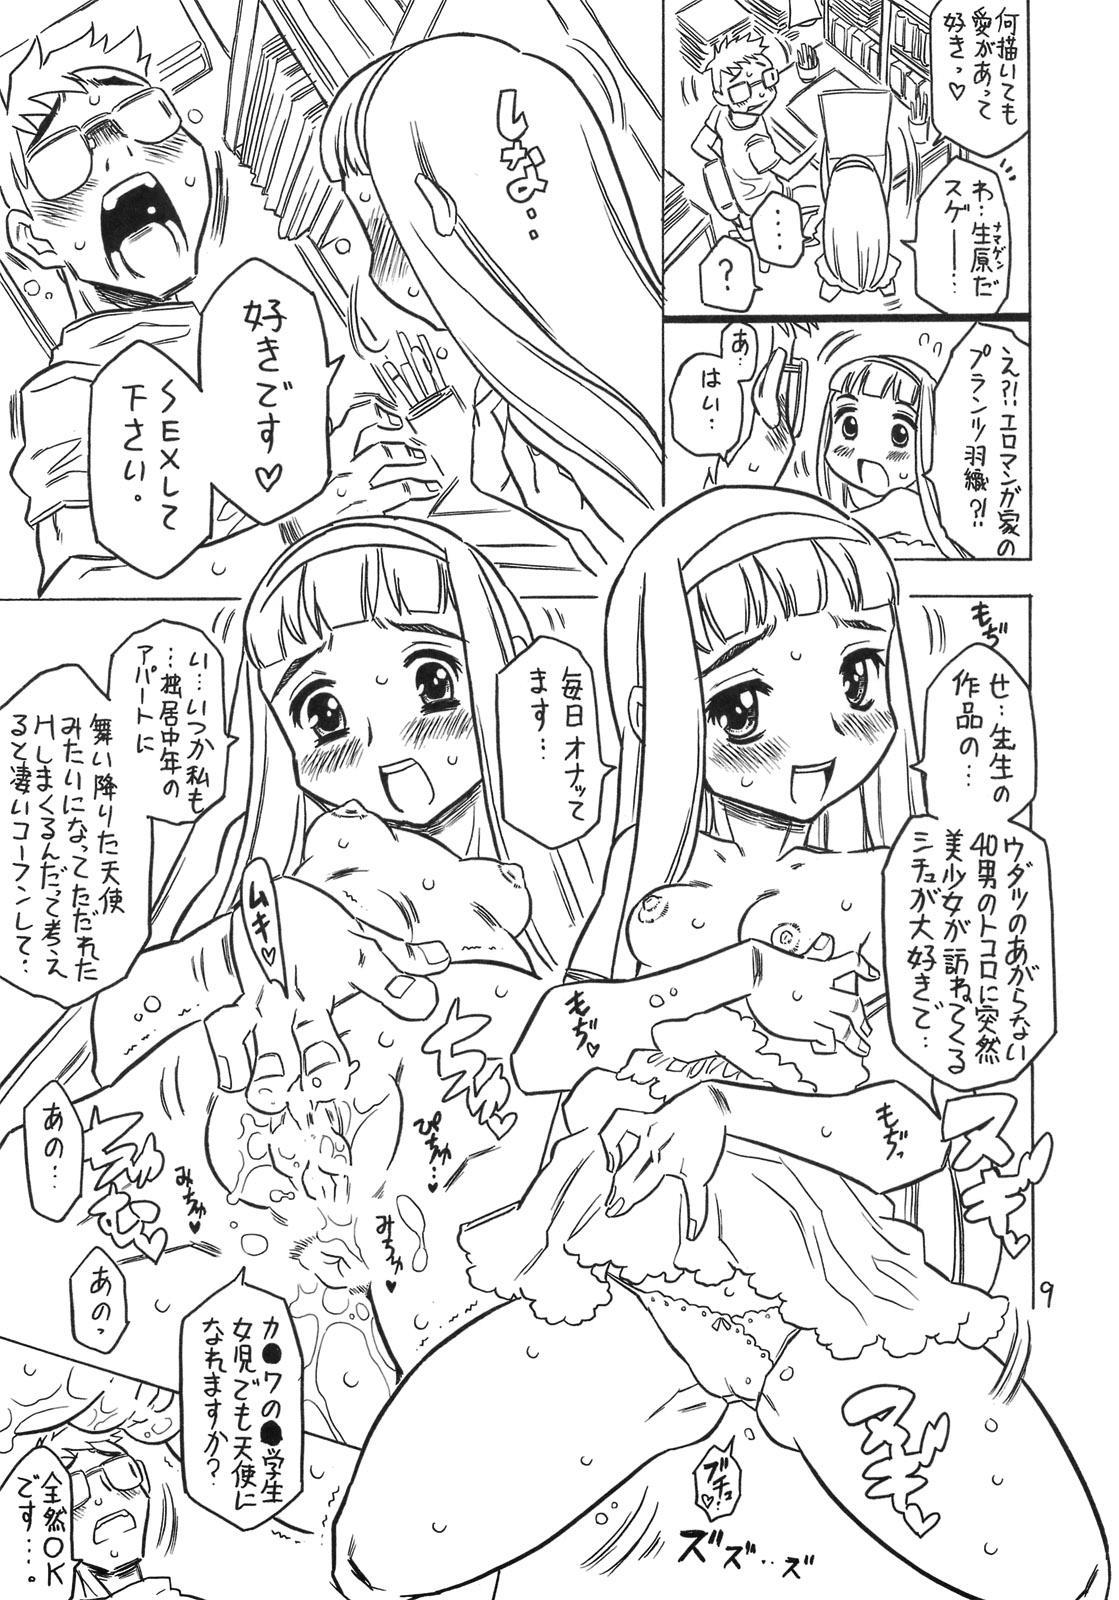 Otonari no Ibuki-san. 7